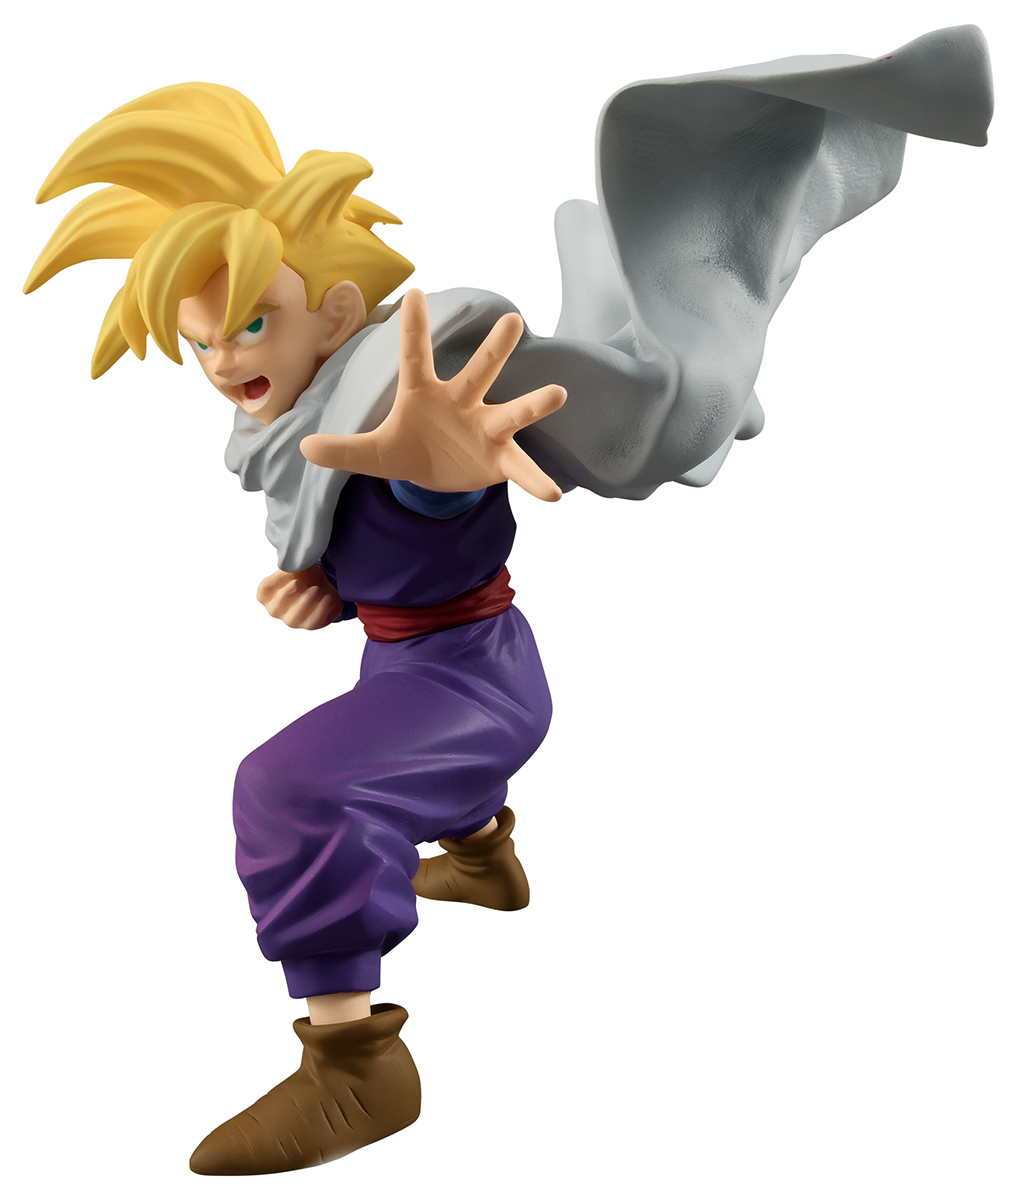 Bandai Фигурка Dragon Ball Styling Son Gohan цена и фото